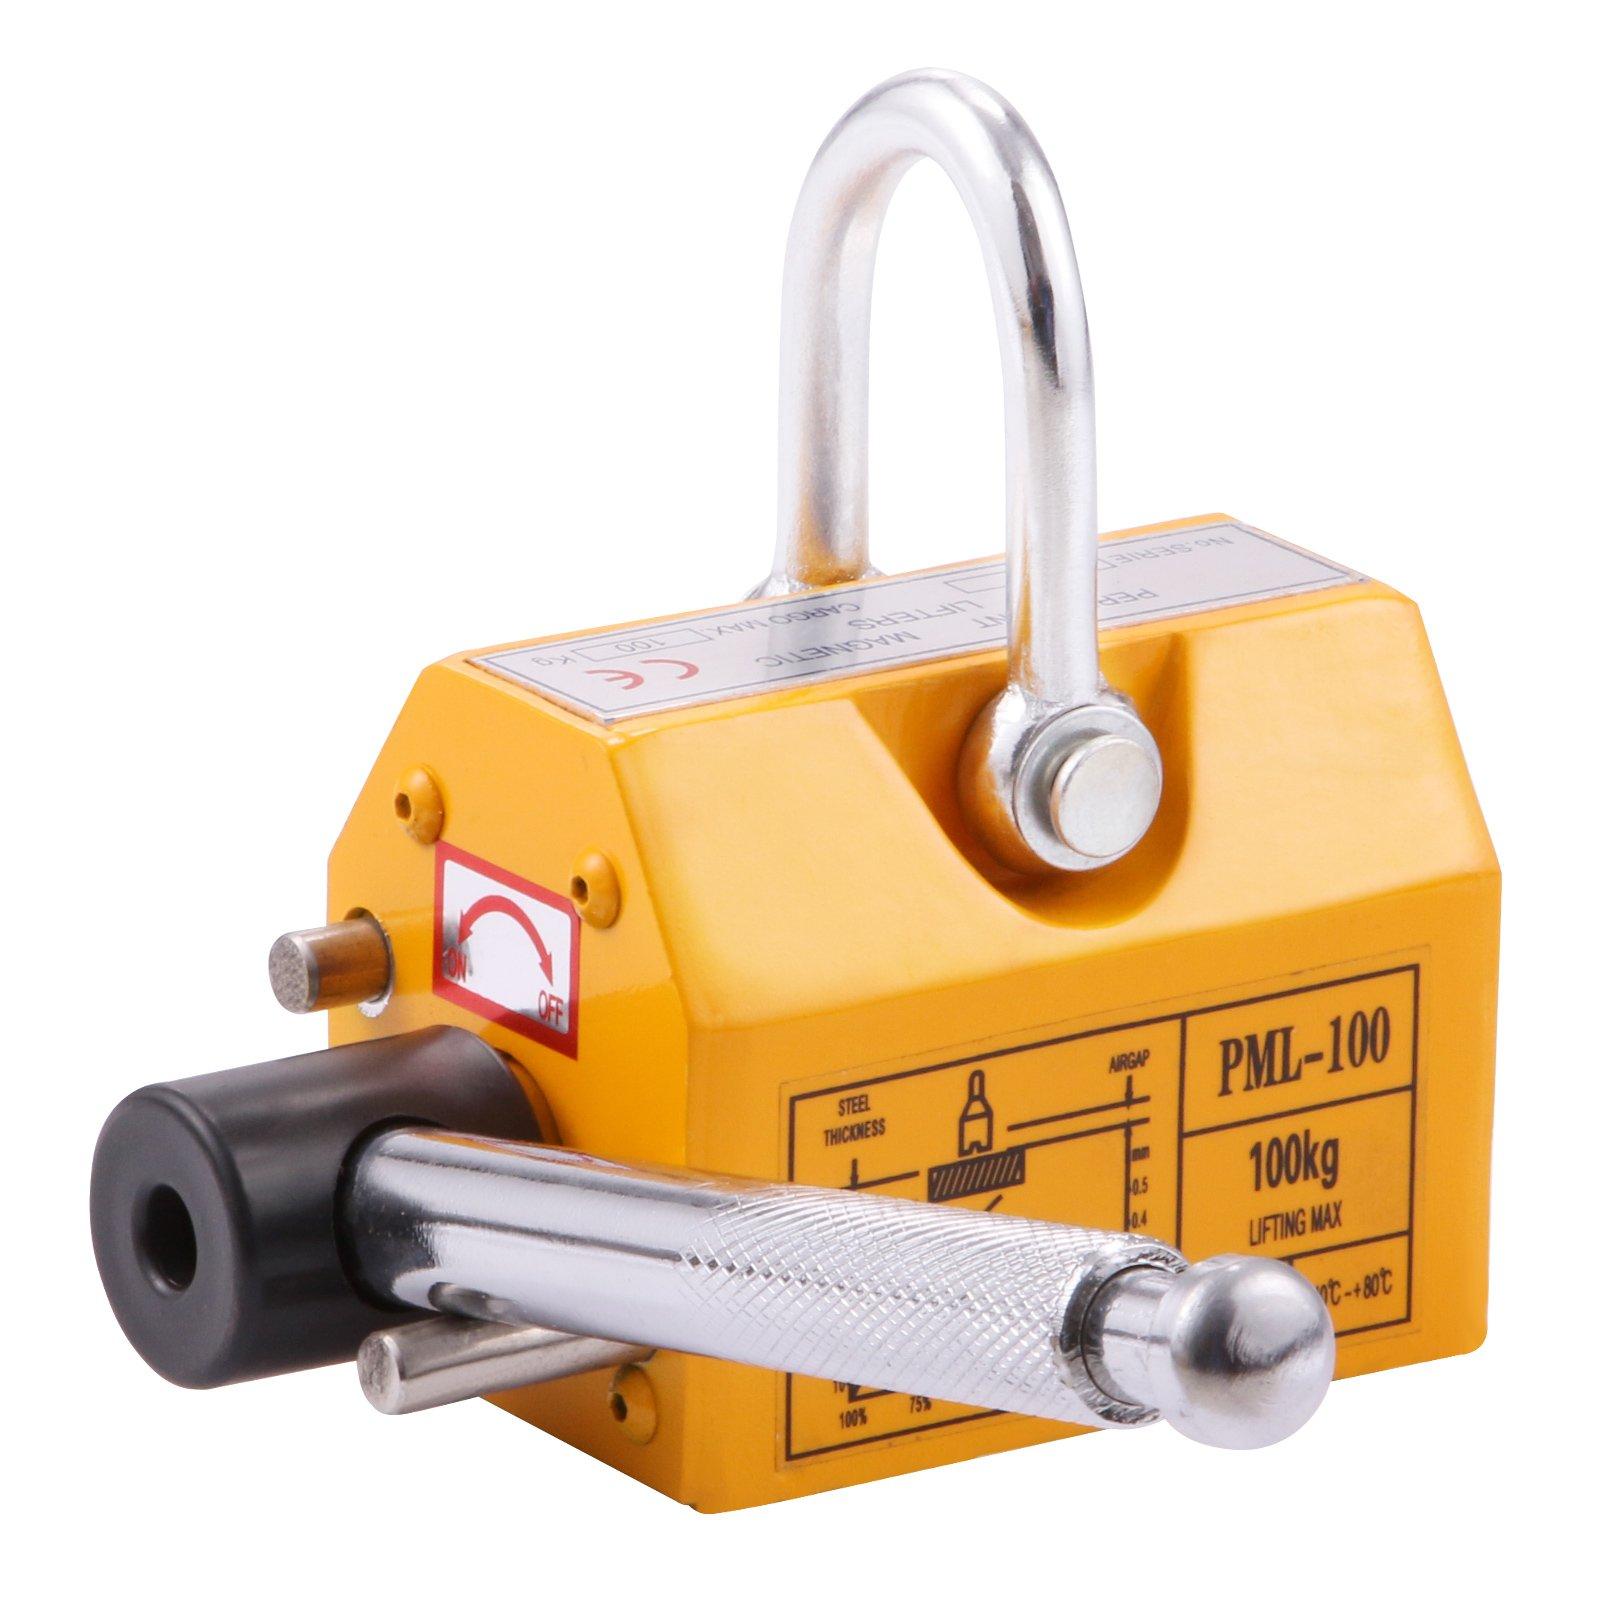 BestEquip Magnetic Lifter Heavy Duty Steel Magnetic Lifter Titanium Alloys Board Magnetic Metal Lifting (220 LBS)